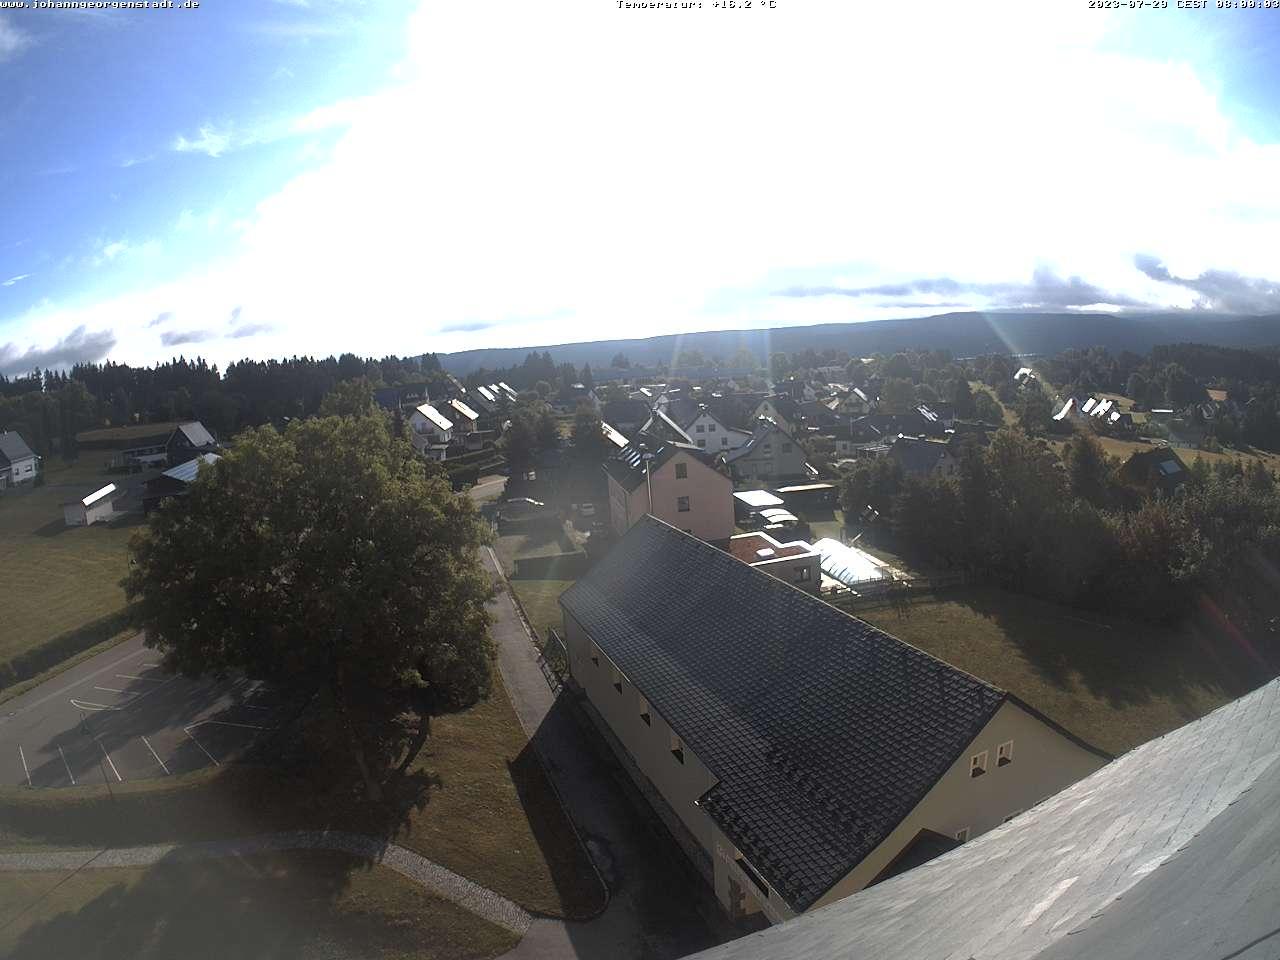 Webcam Skigebied Johanngeorgenstadt cam 2 - Ertsgebergte